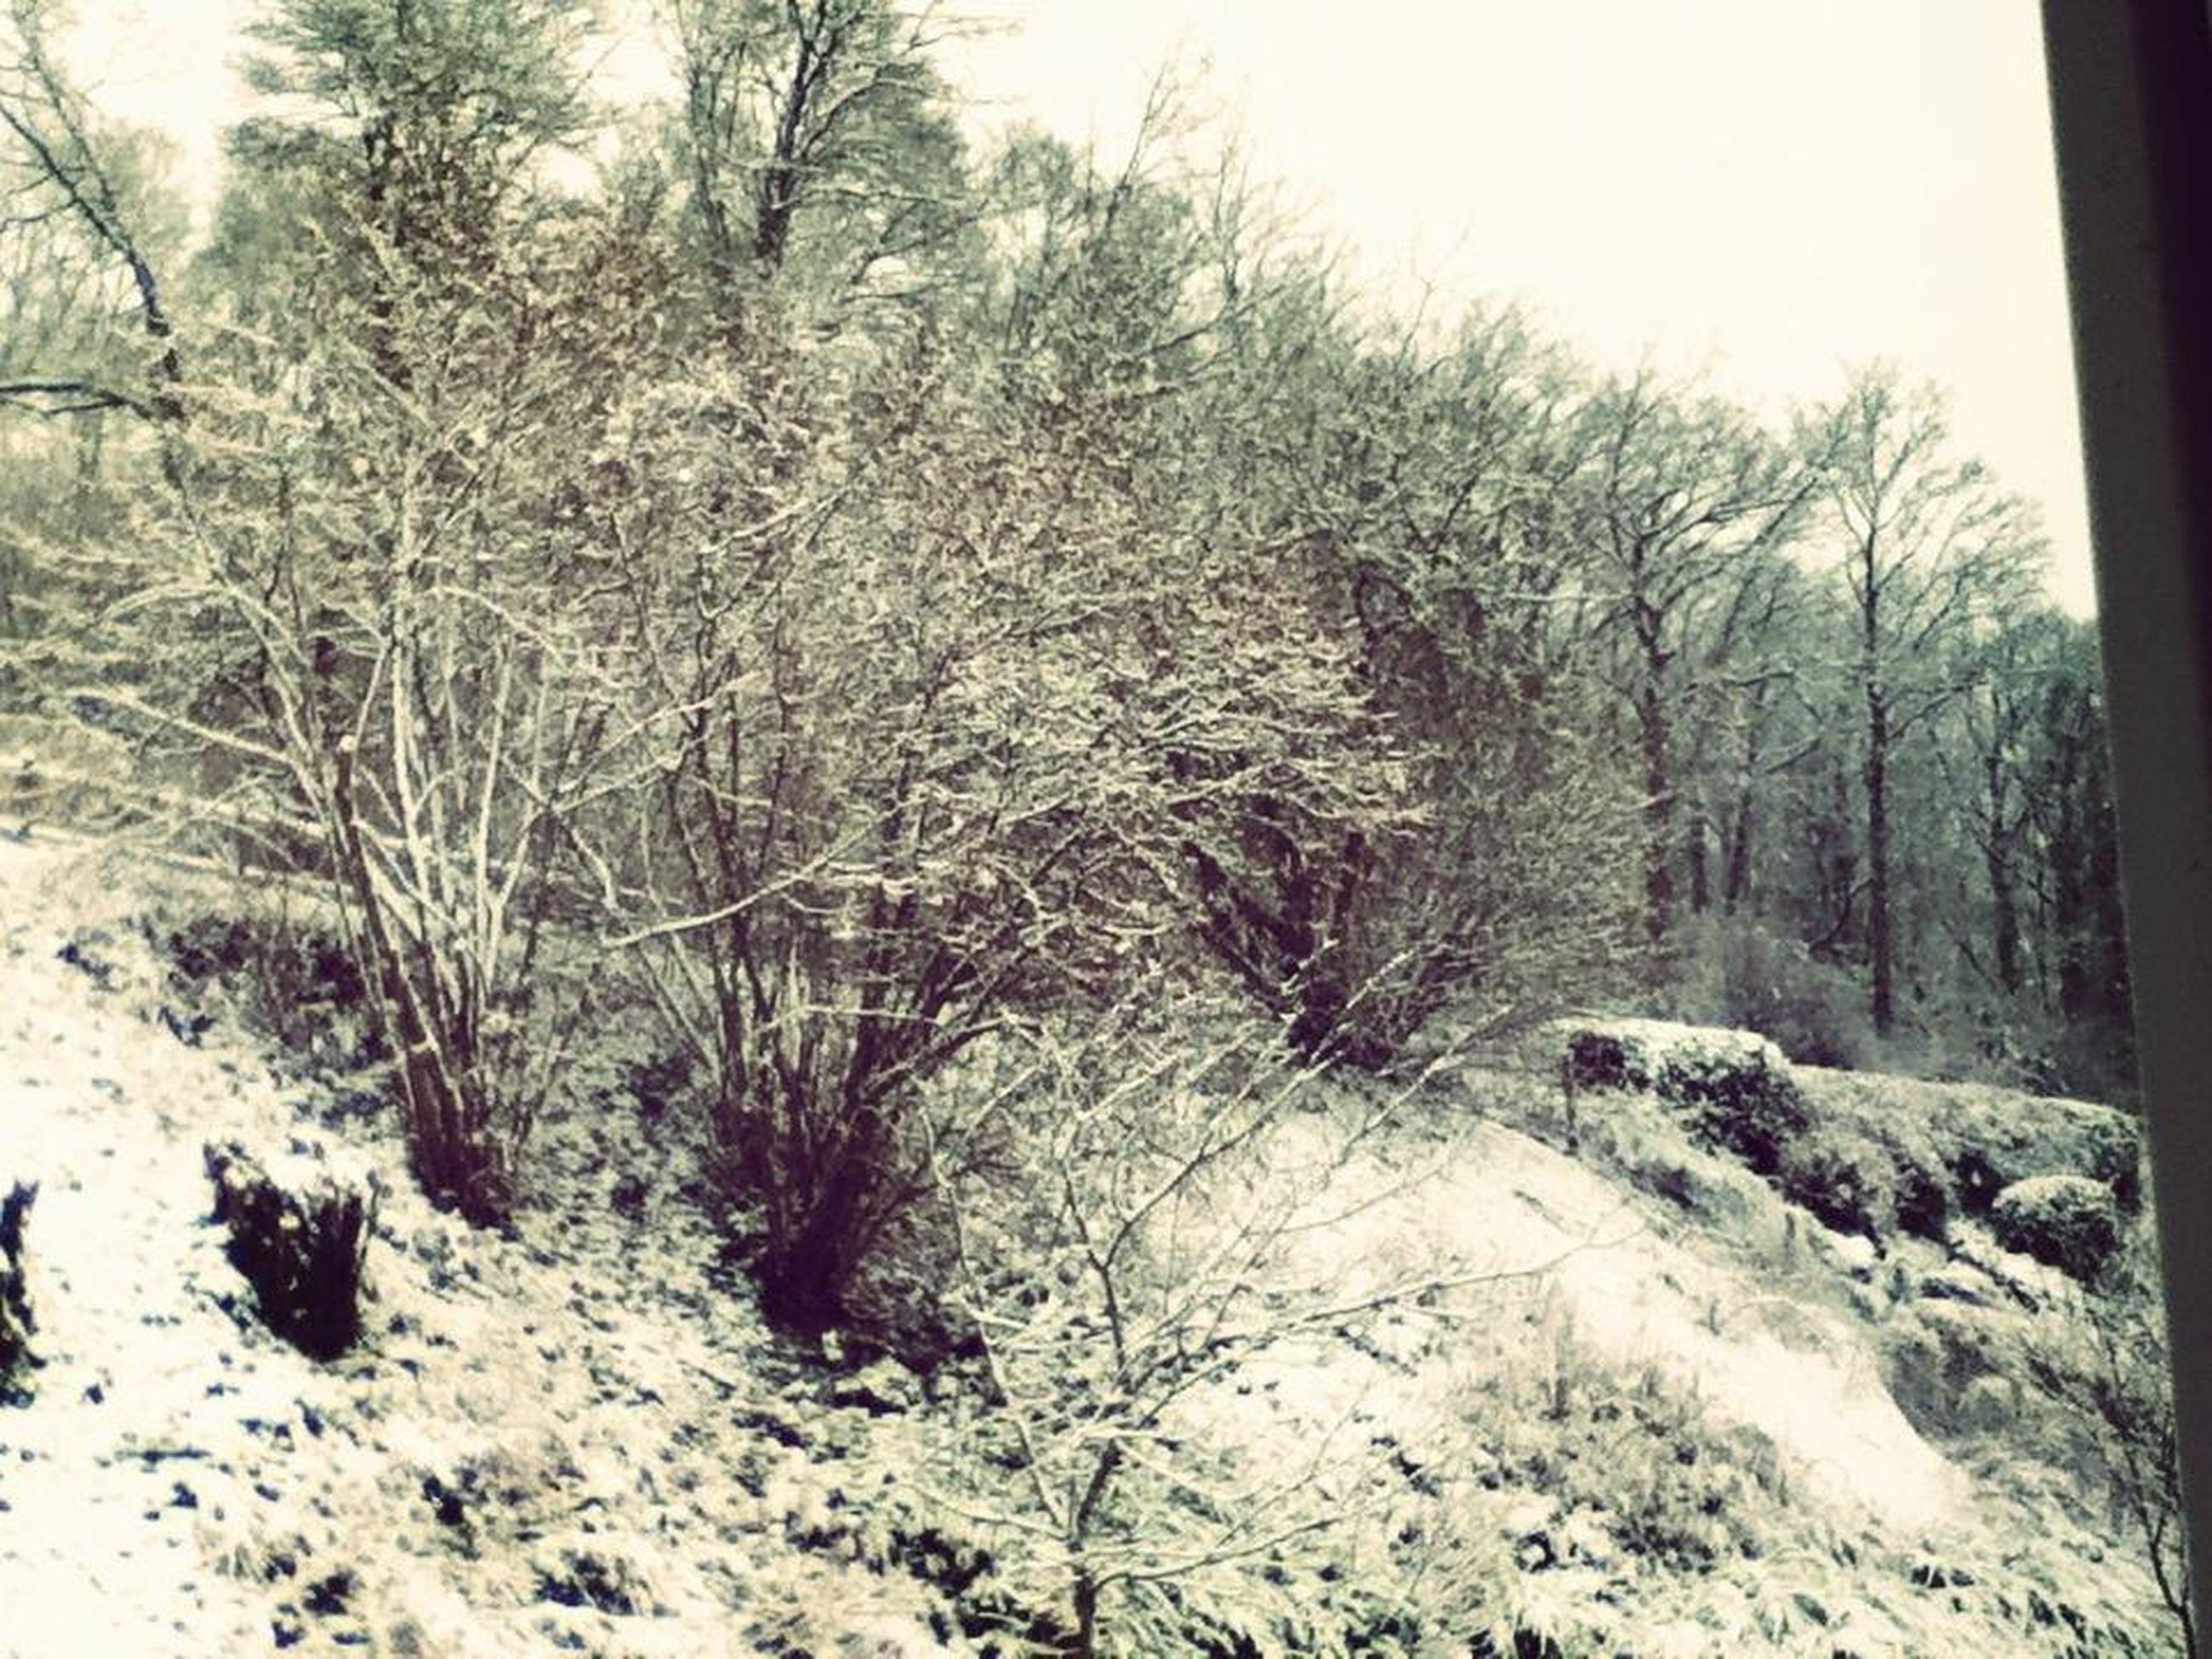 snow, winter, cold temperature, tree, season, weather, bare tree, tranquility, covering, tranquil scene, nature, landscape, beauty in nature, branch, scenics, frozen, field, covered, non-urban scene, growth